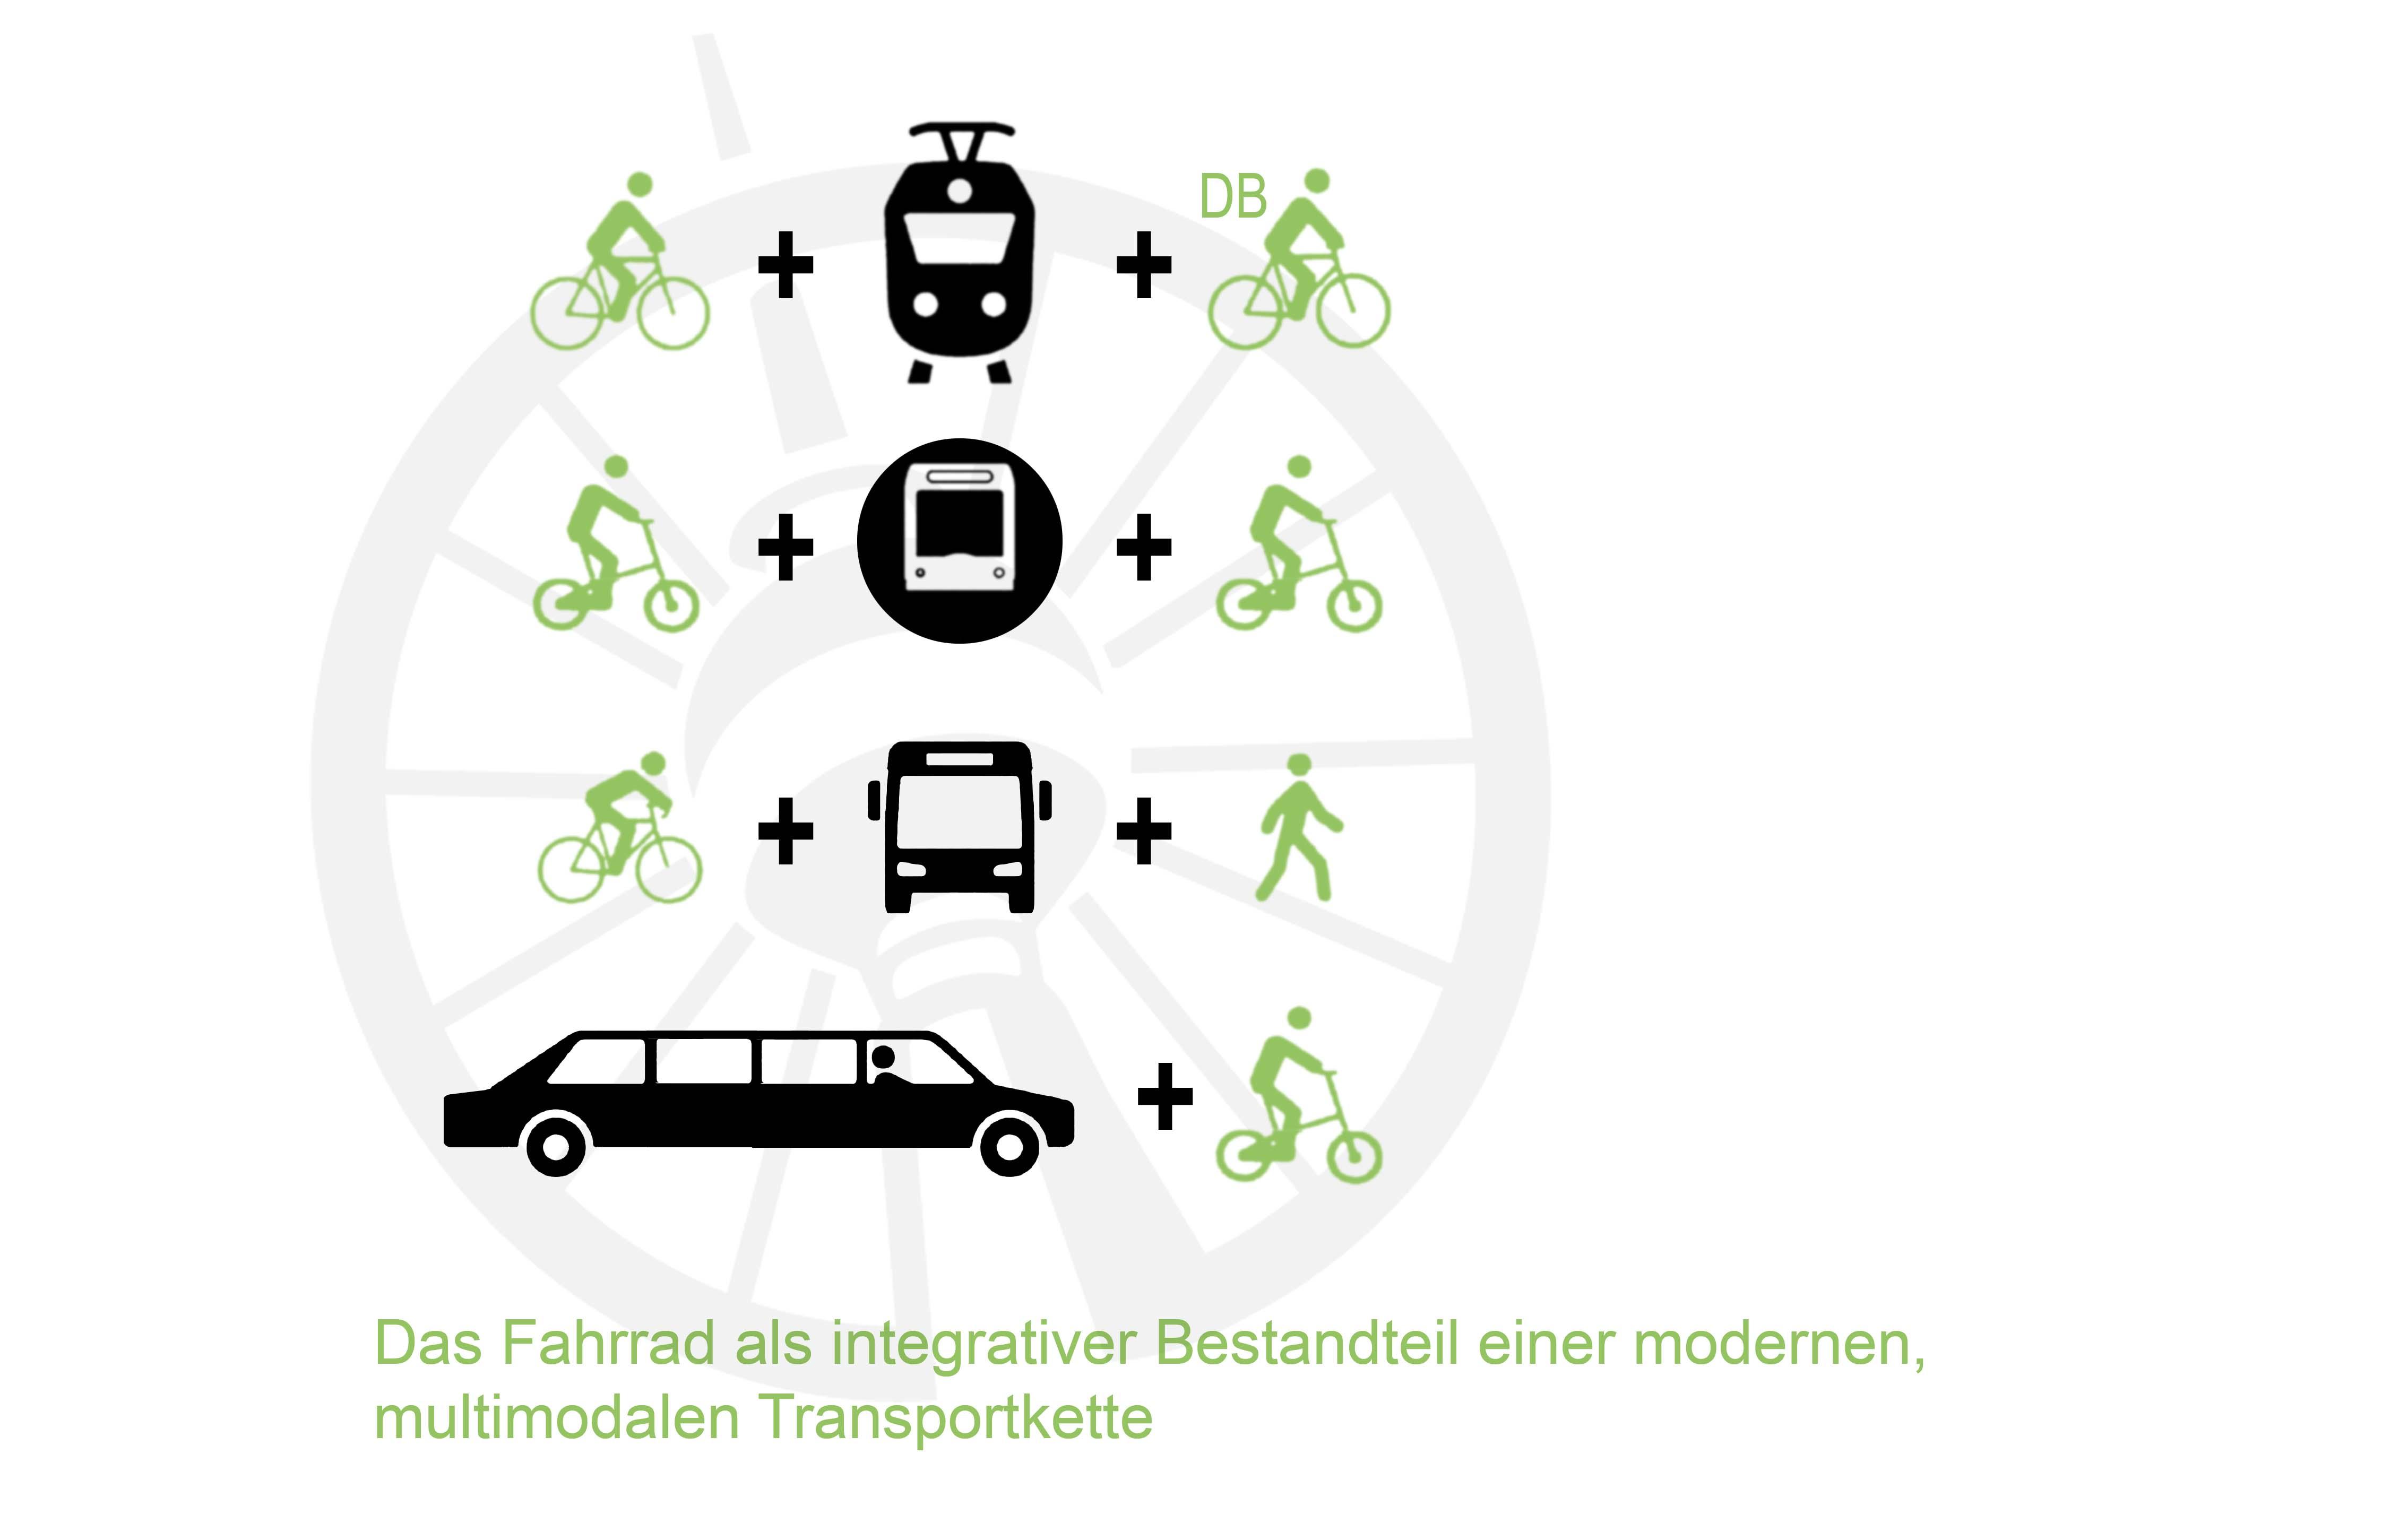 Das Fahrrad als Teil multimodaler Mobilität